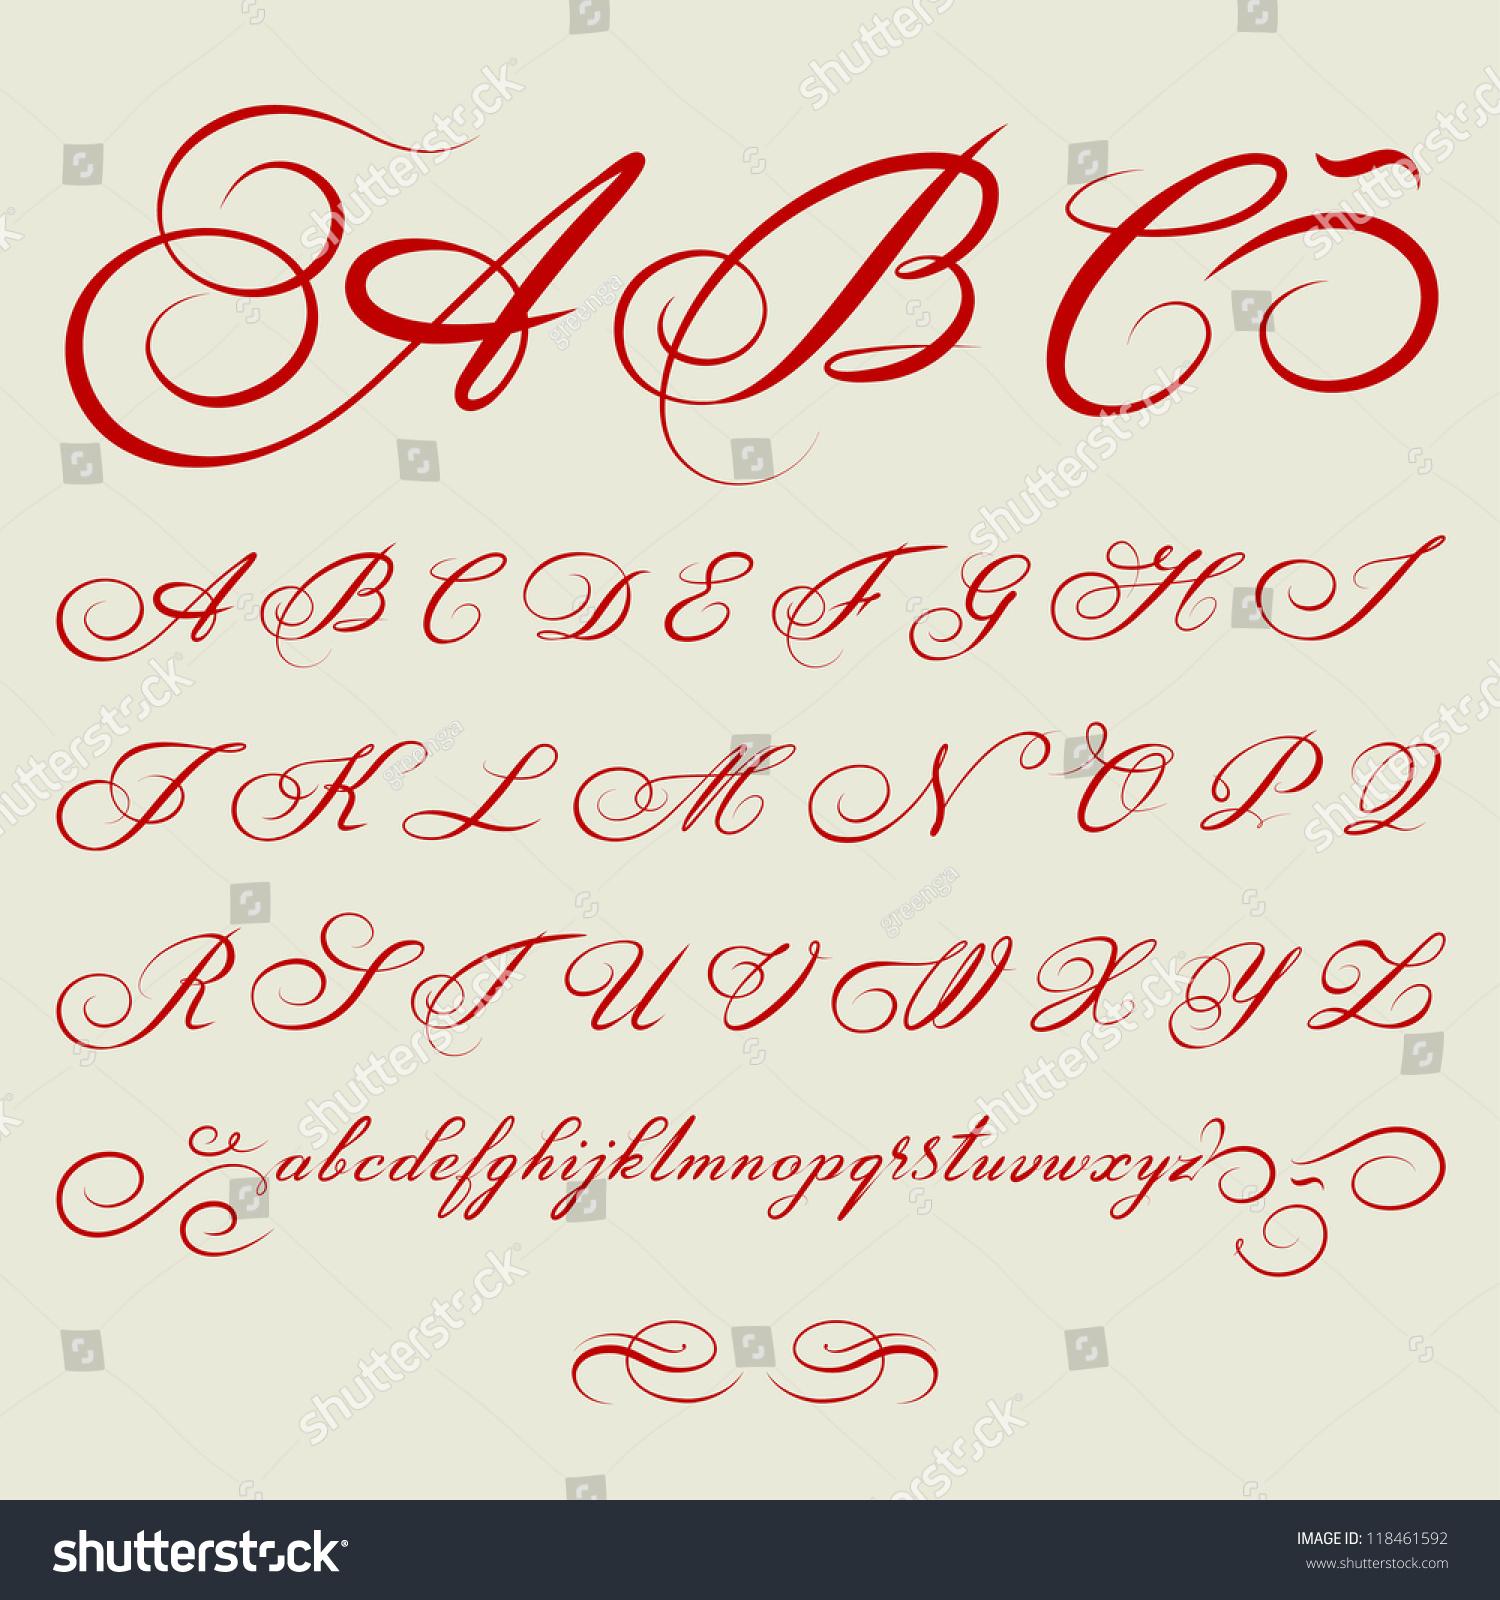 Vector hand drawn calligraphic alphabet based immagine